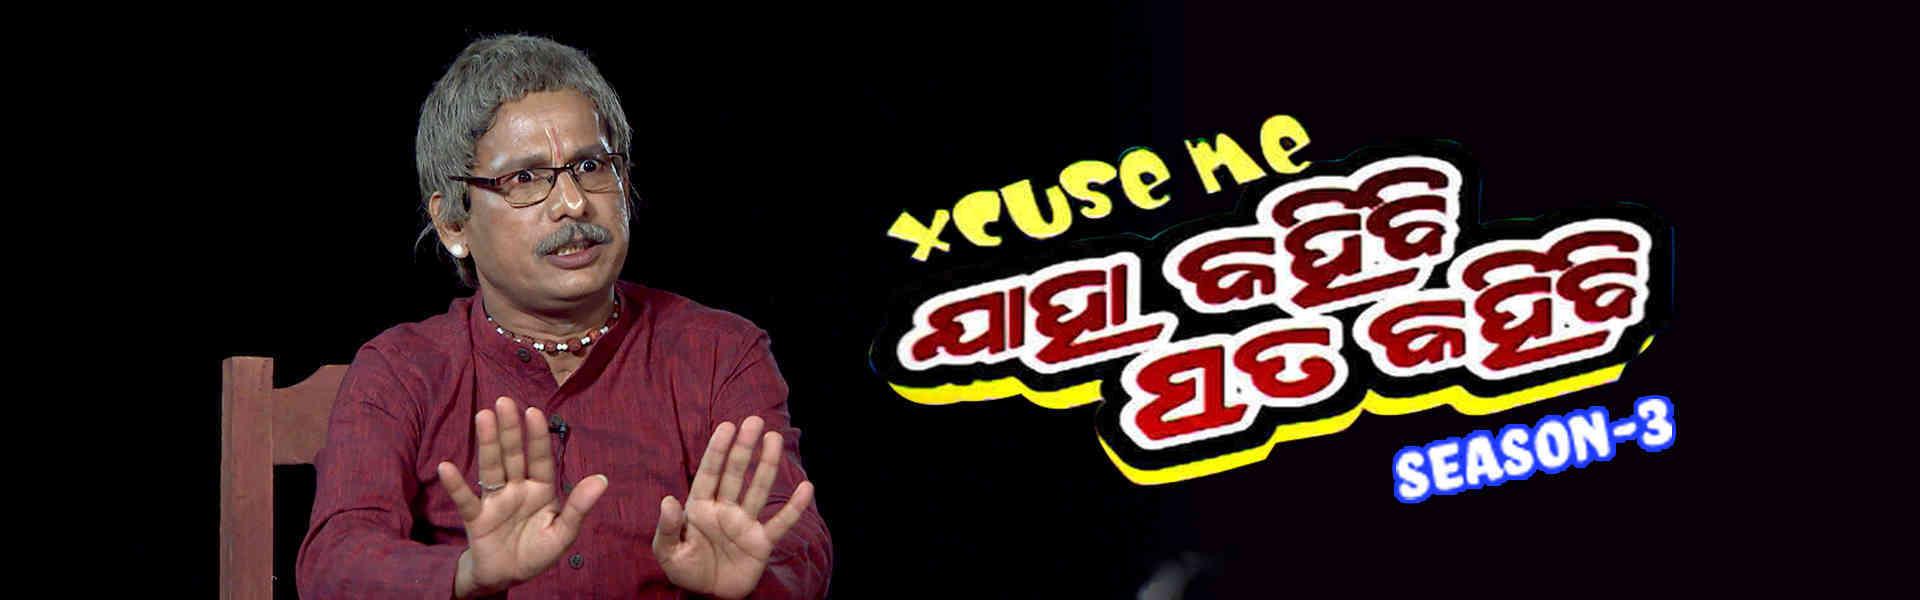 Execuse Me Jaha Kahibi Sata Kahibi Season- 3